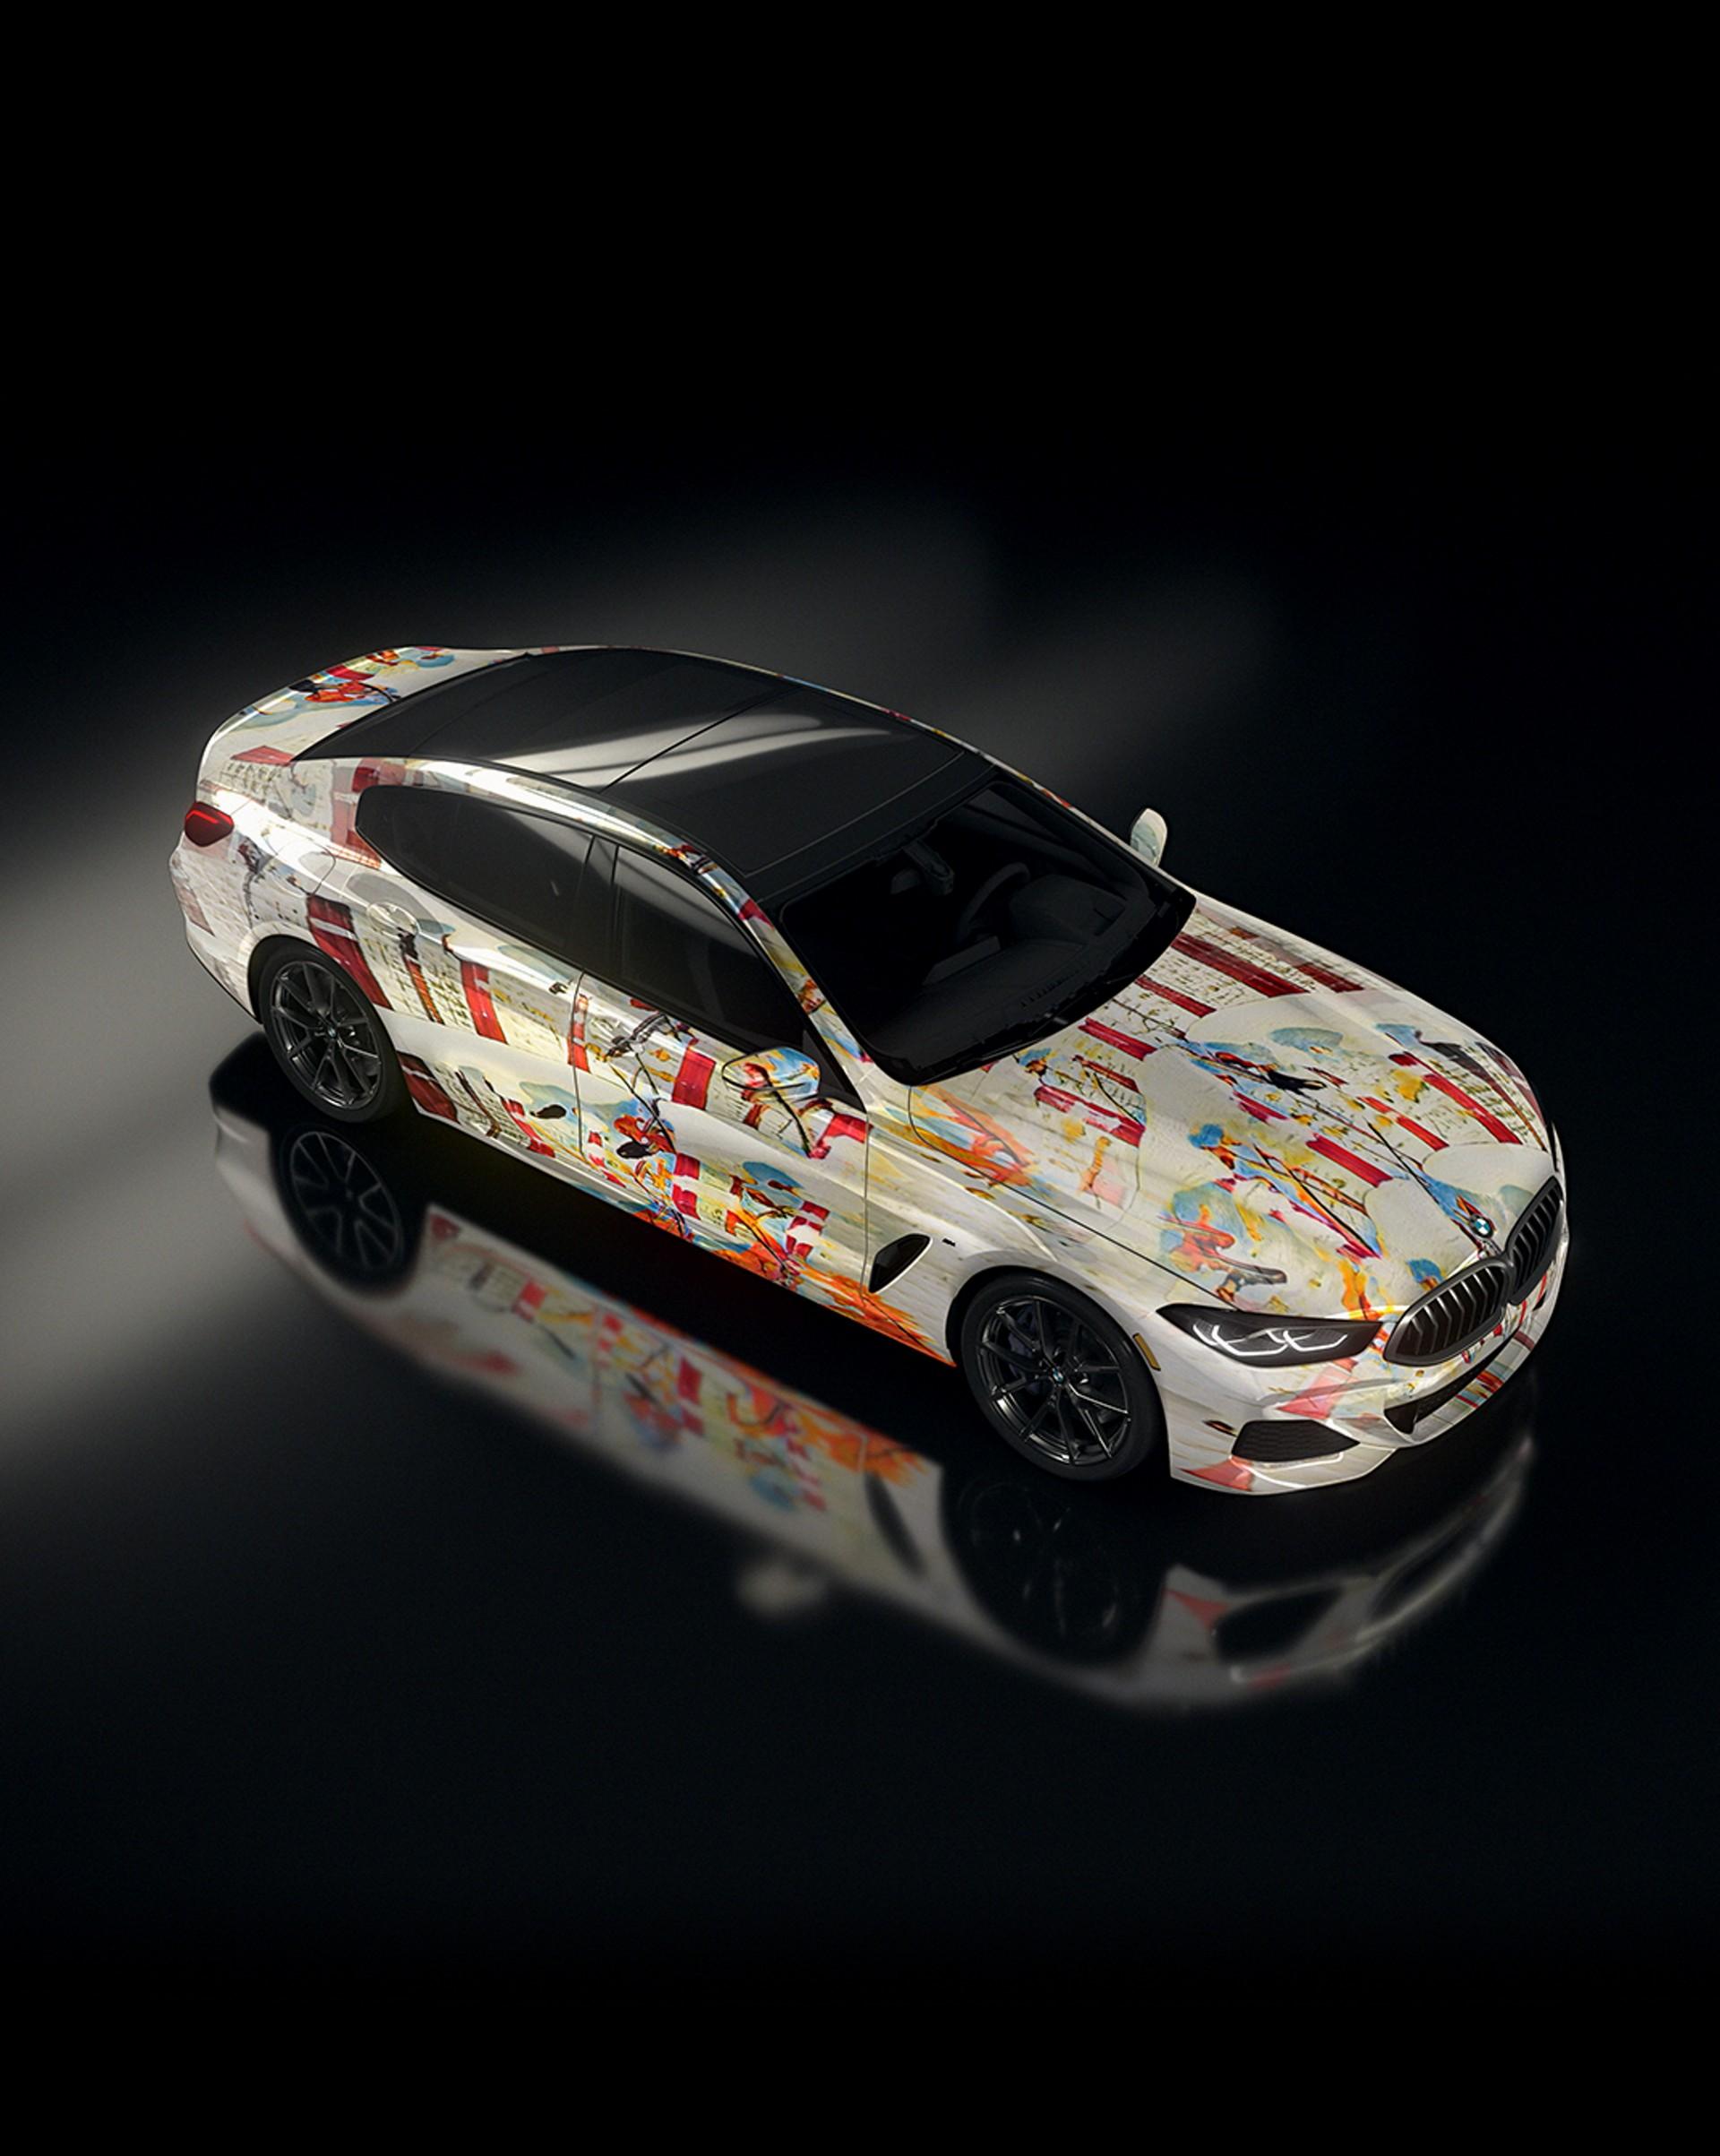 BMW-8-Series-Gran-Coupe-art-car-33